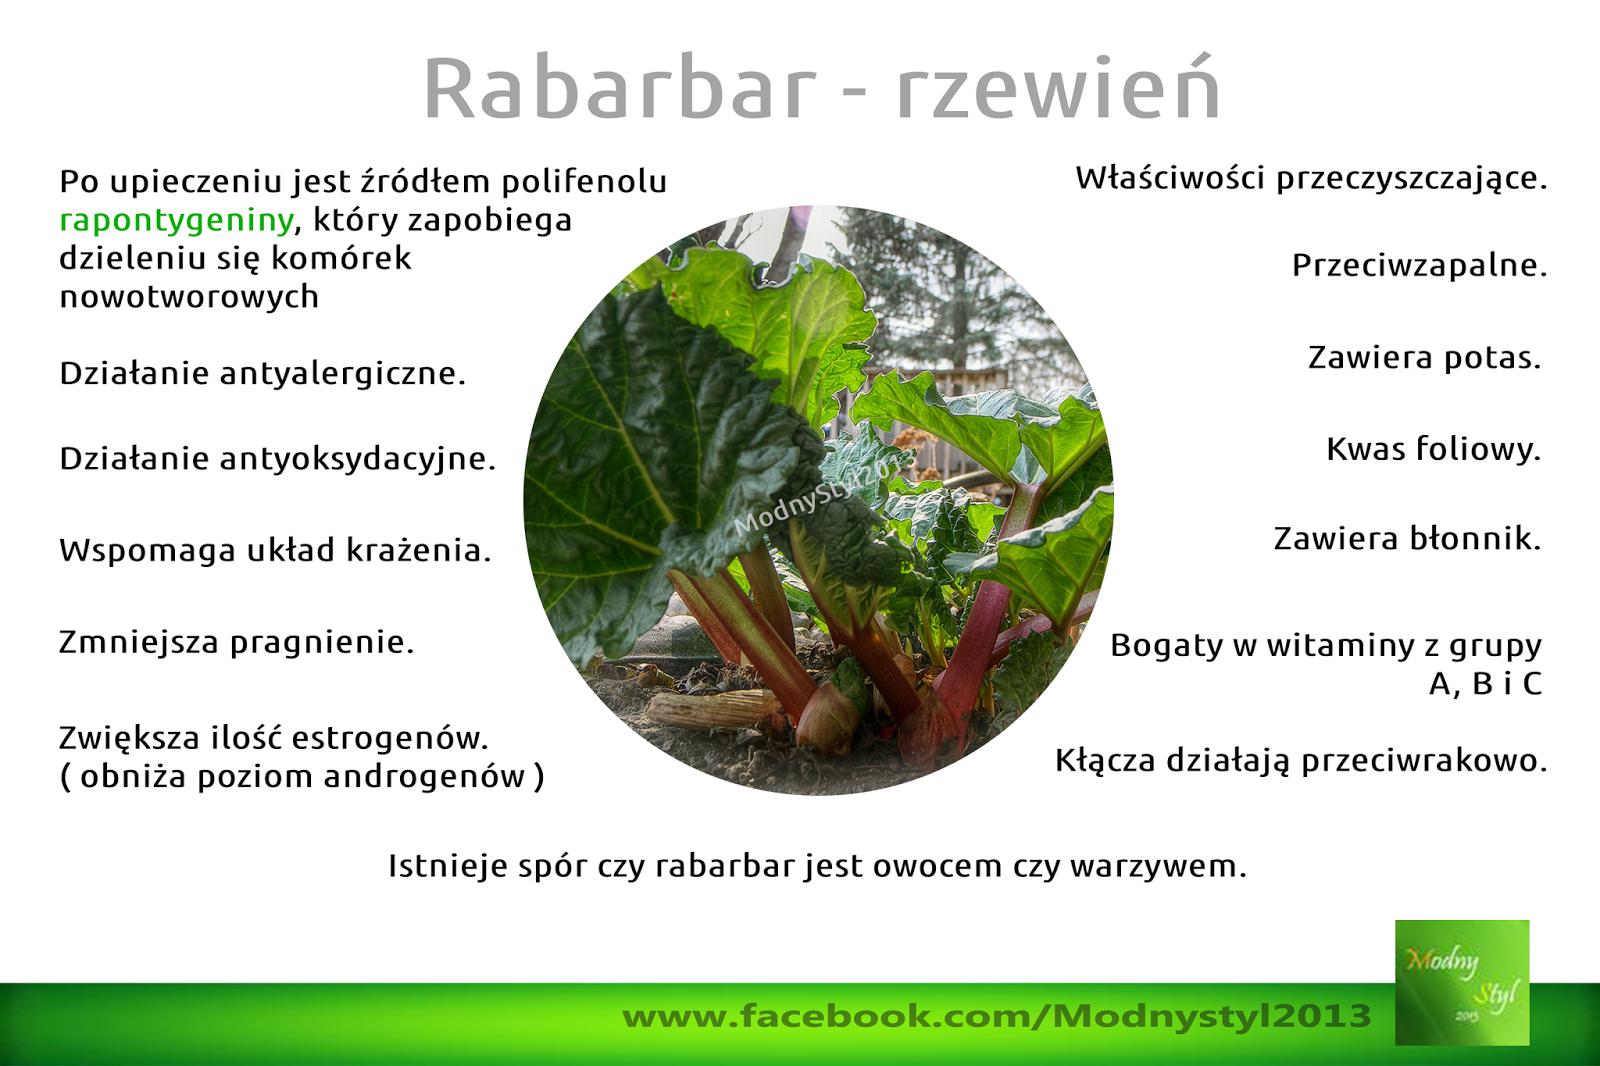 Rabarbar - rzewień